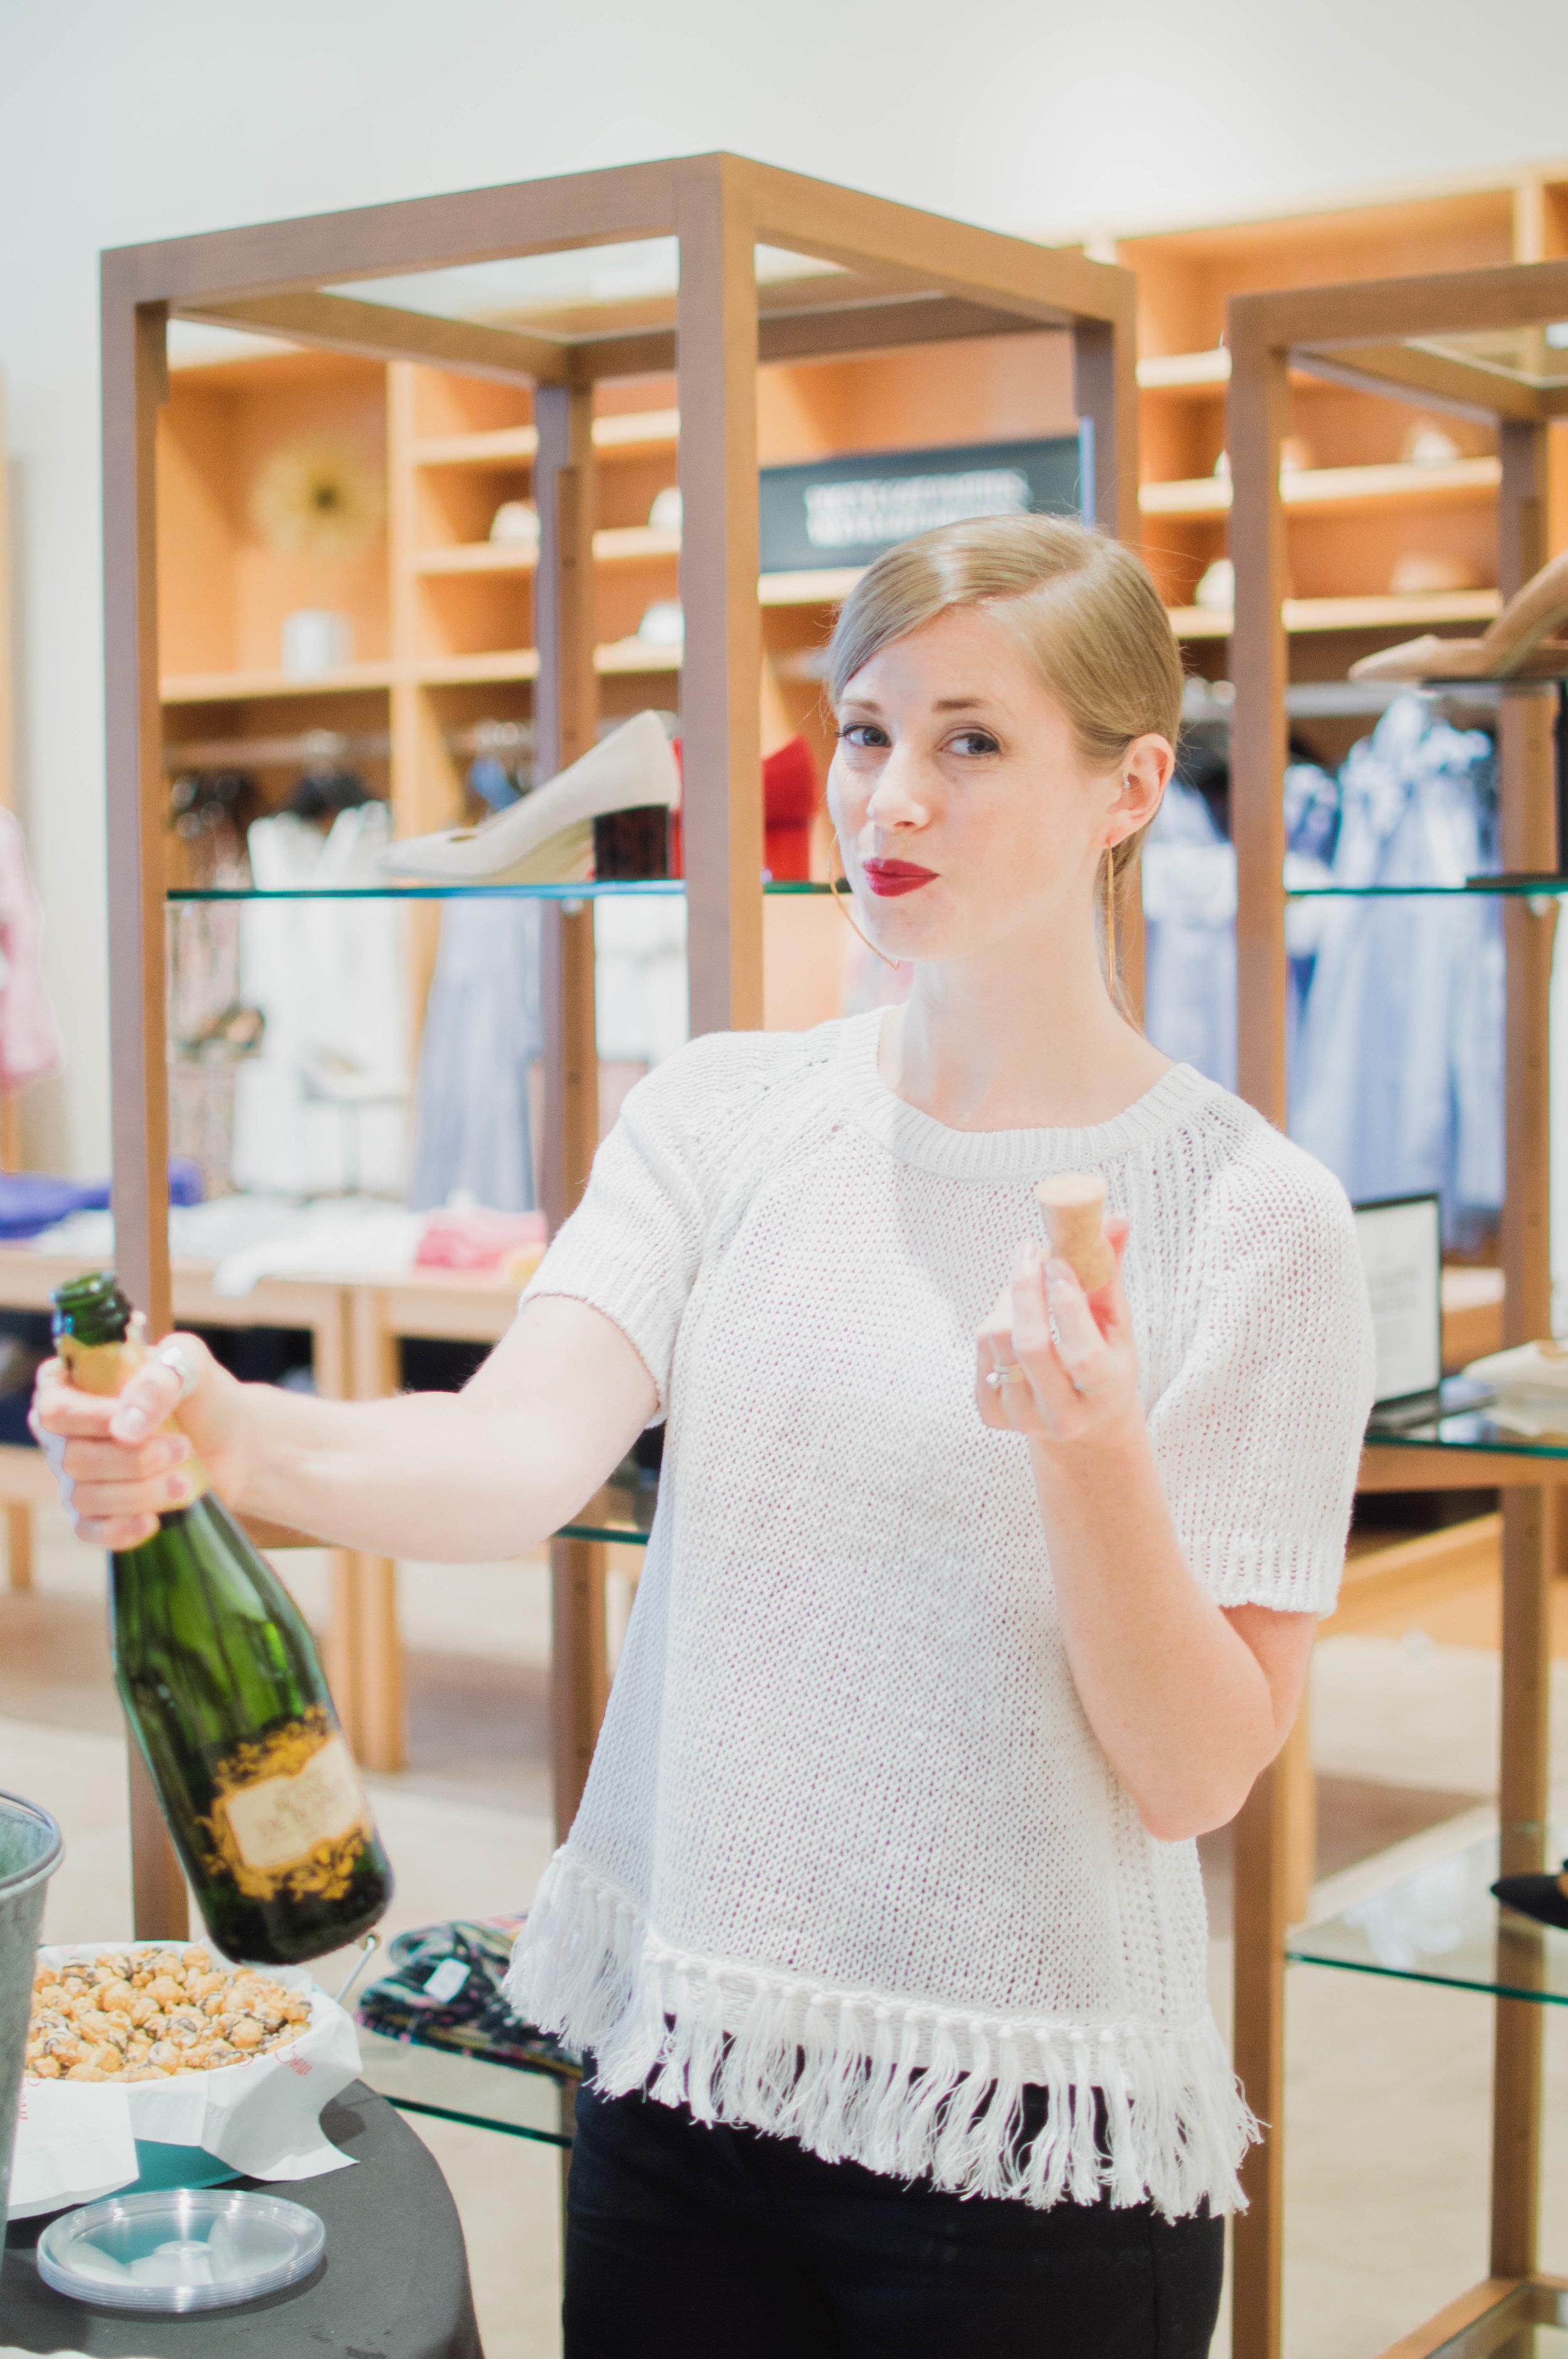 jcrew-new-arrivals-champagne